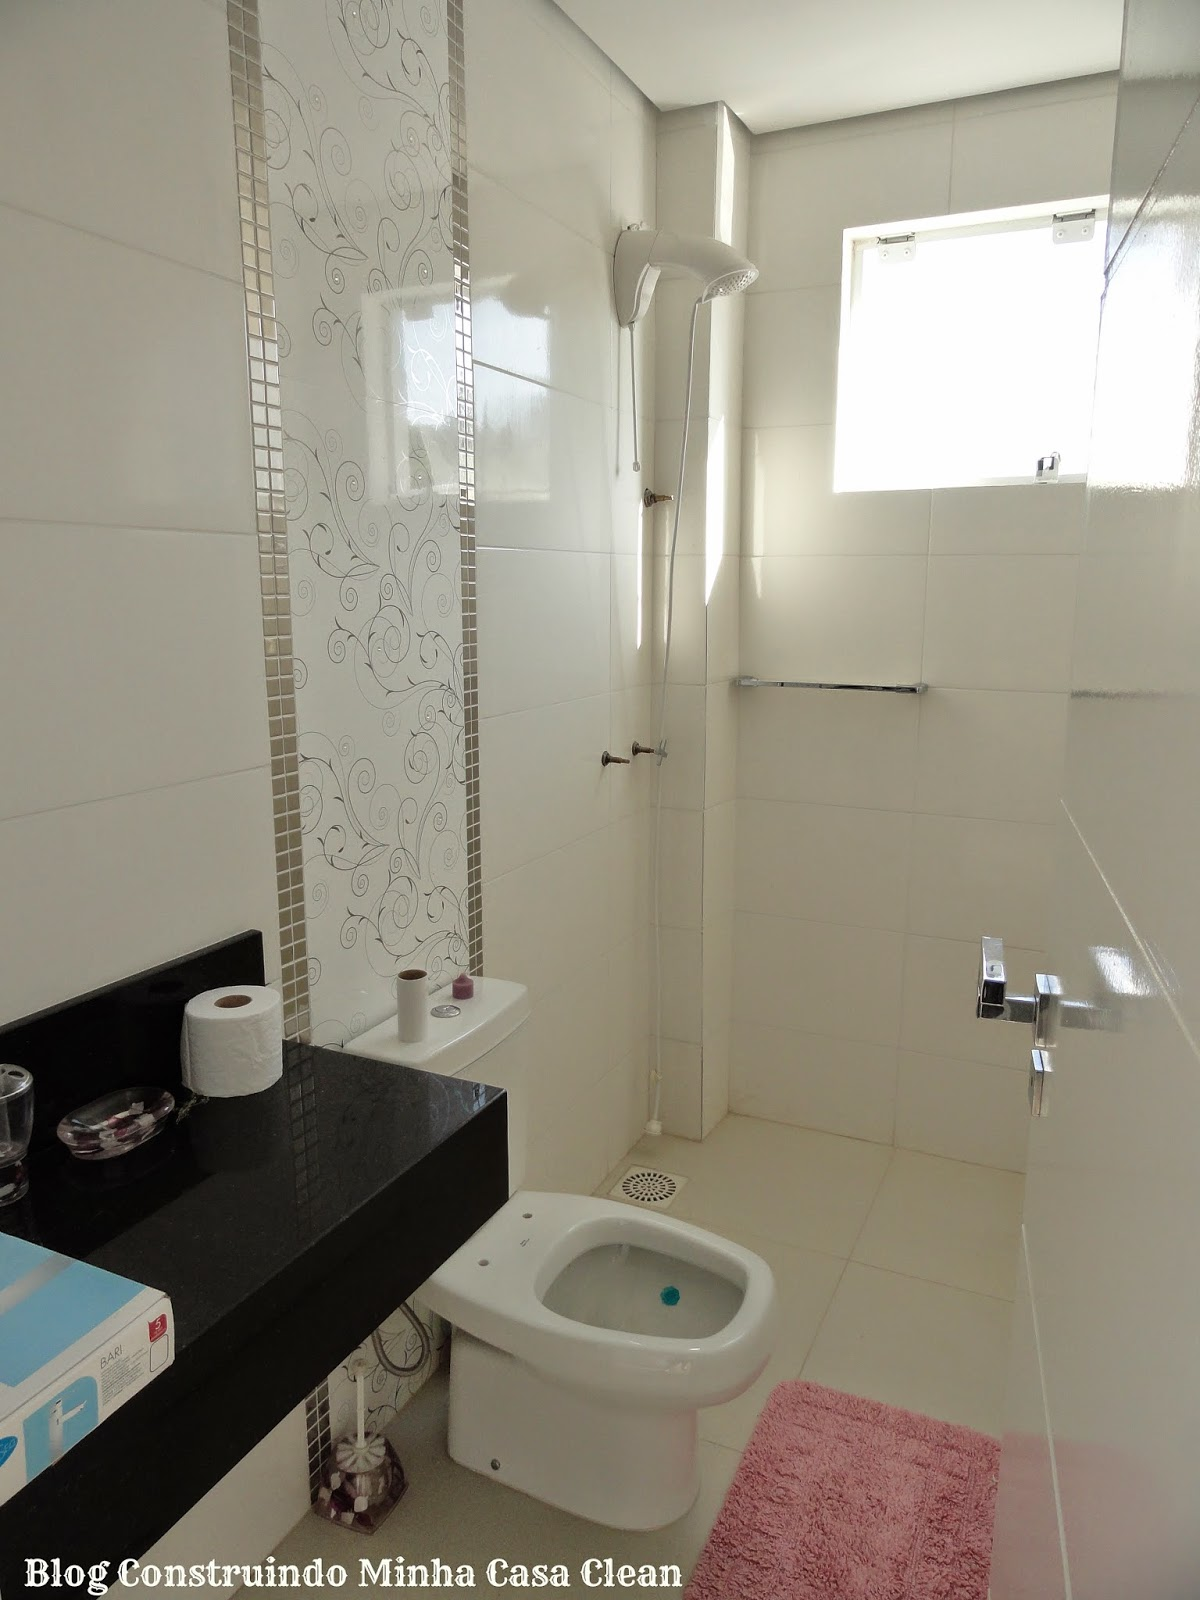 Imagens de #416B78 Construindo Minha Casa Clean: Meus Pisos Porcelanato e Laminado! O que  1200x1600 px 2824 Box Banheiro Limpeza